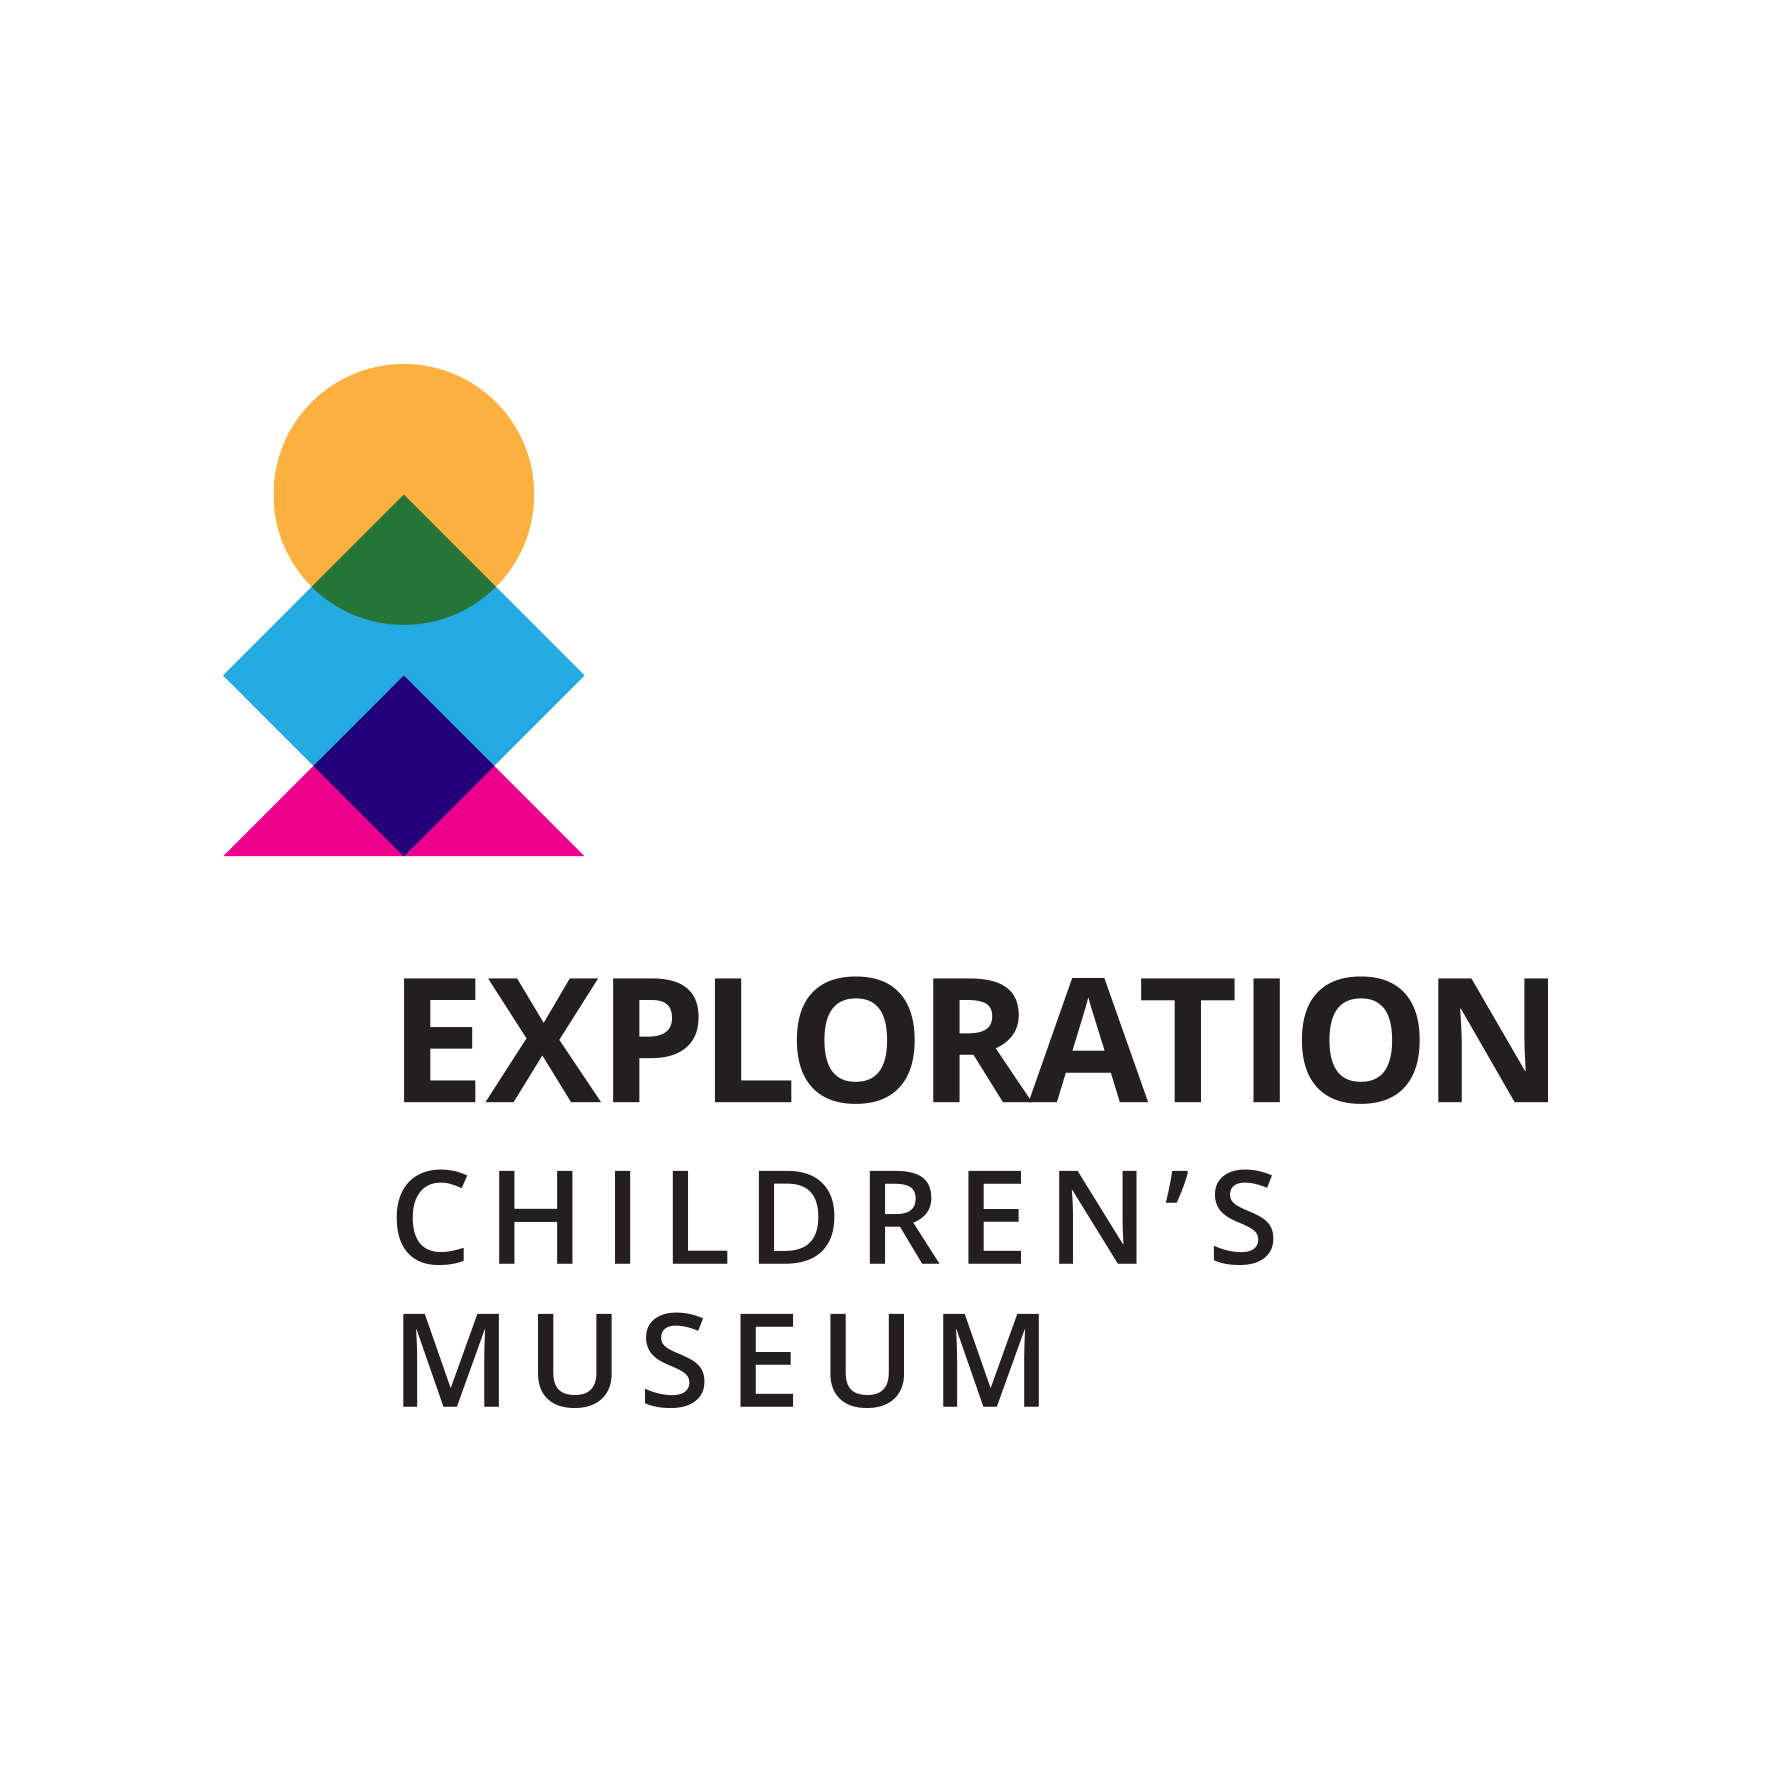 ExplorationChildrensMuseum-logo.jpg